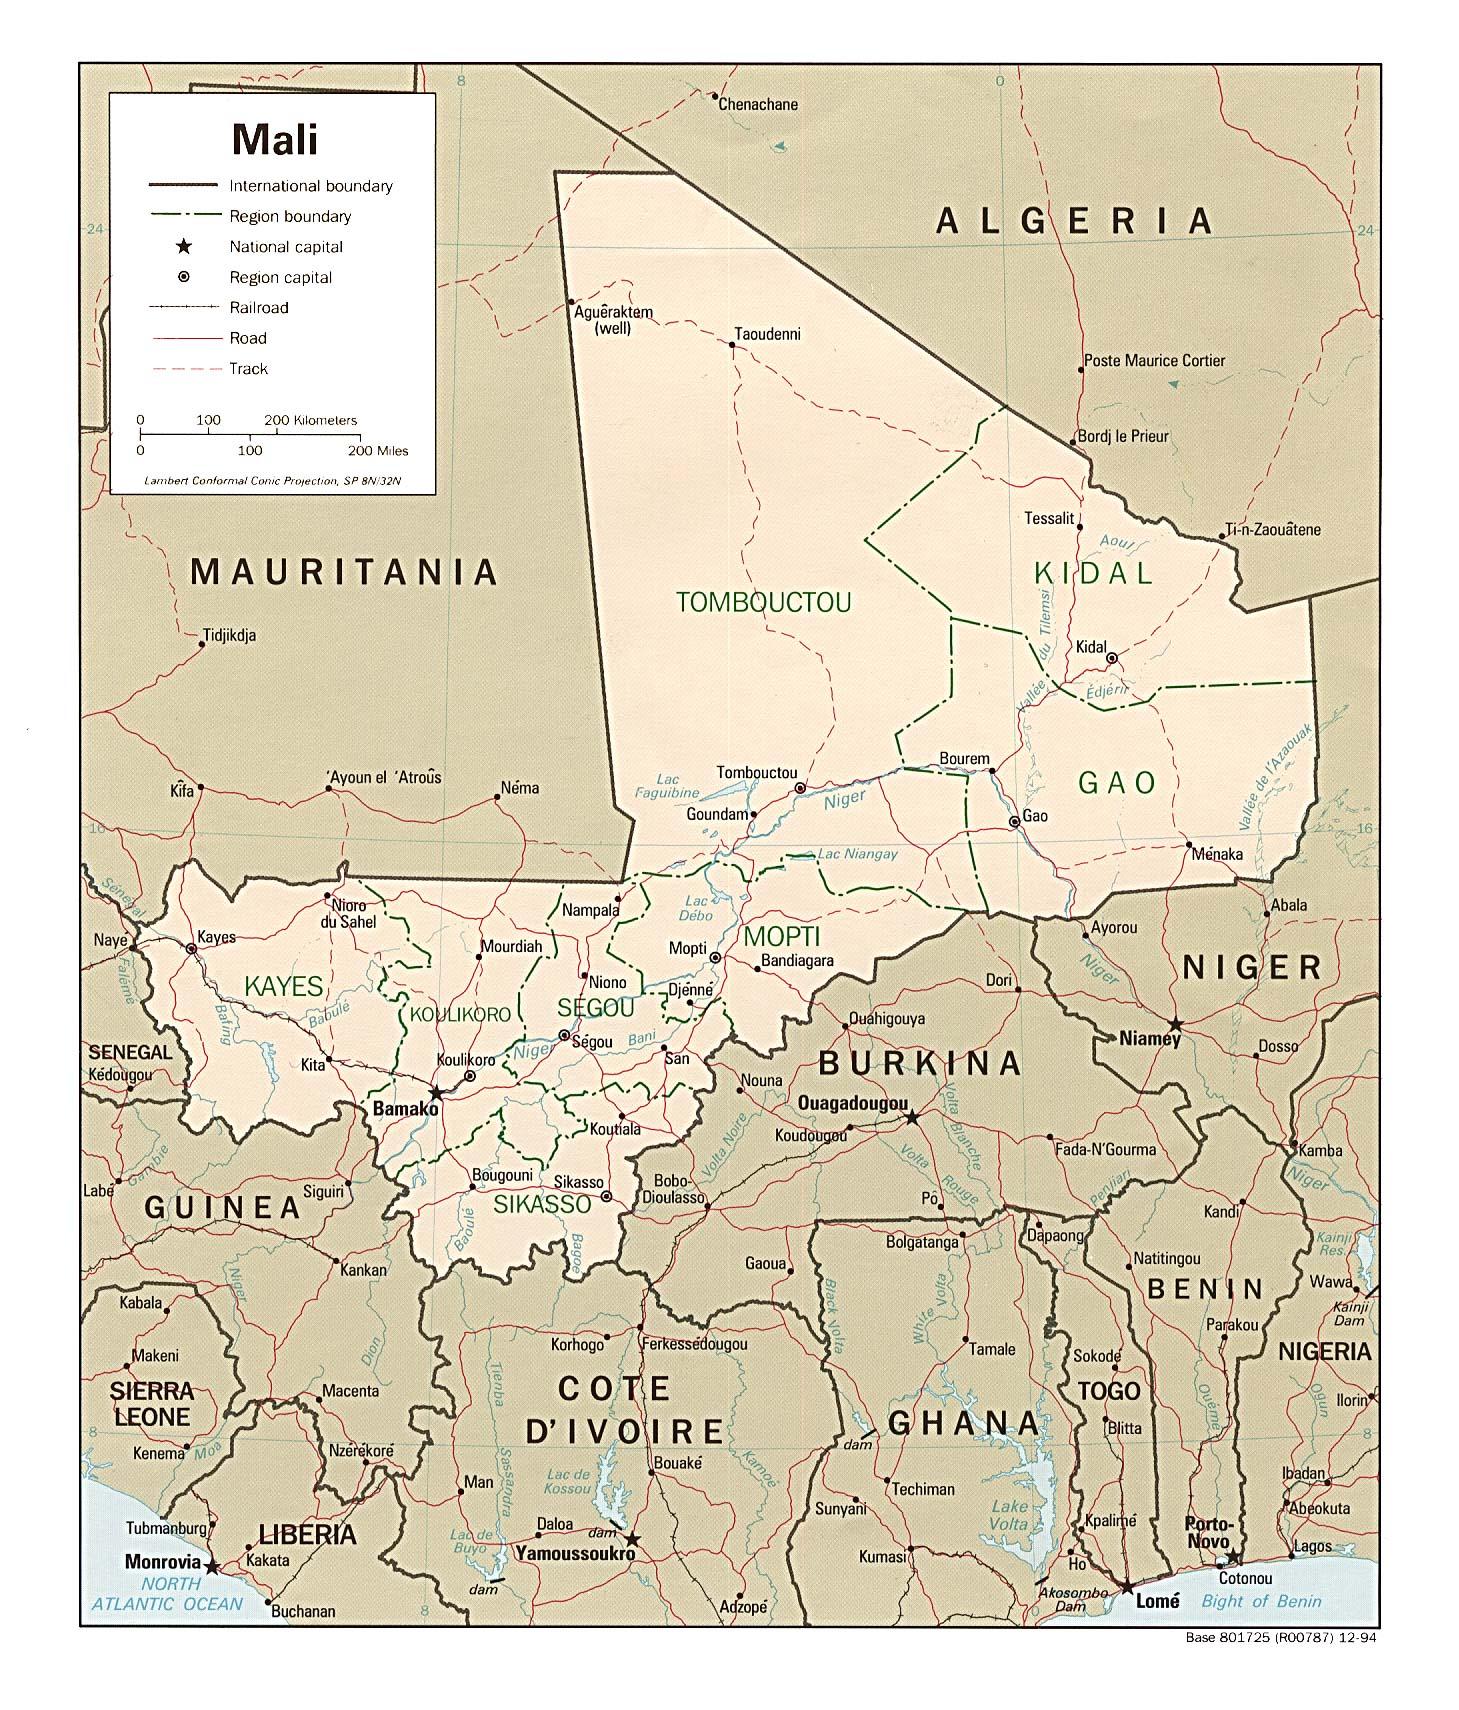 Mapa Politico de Malí